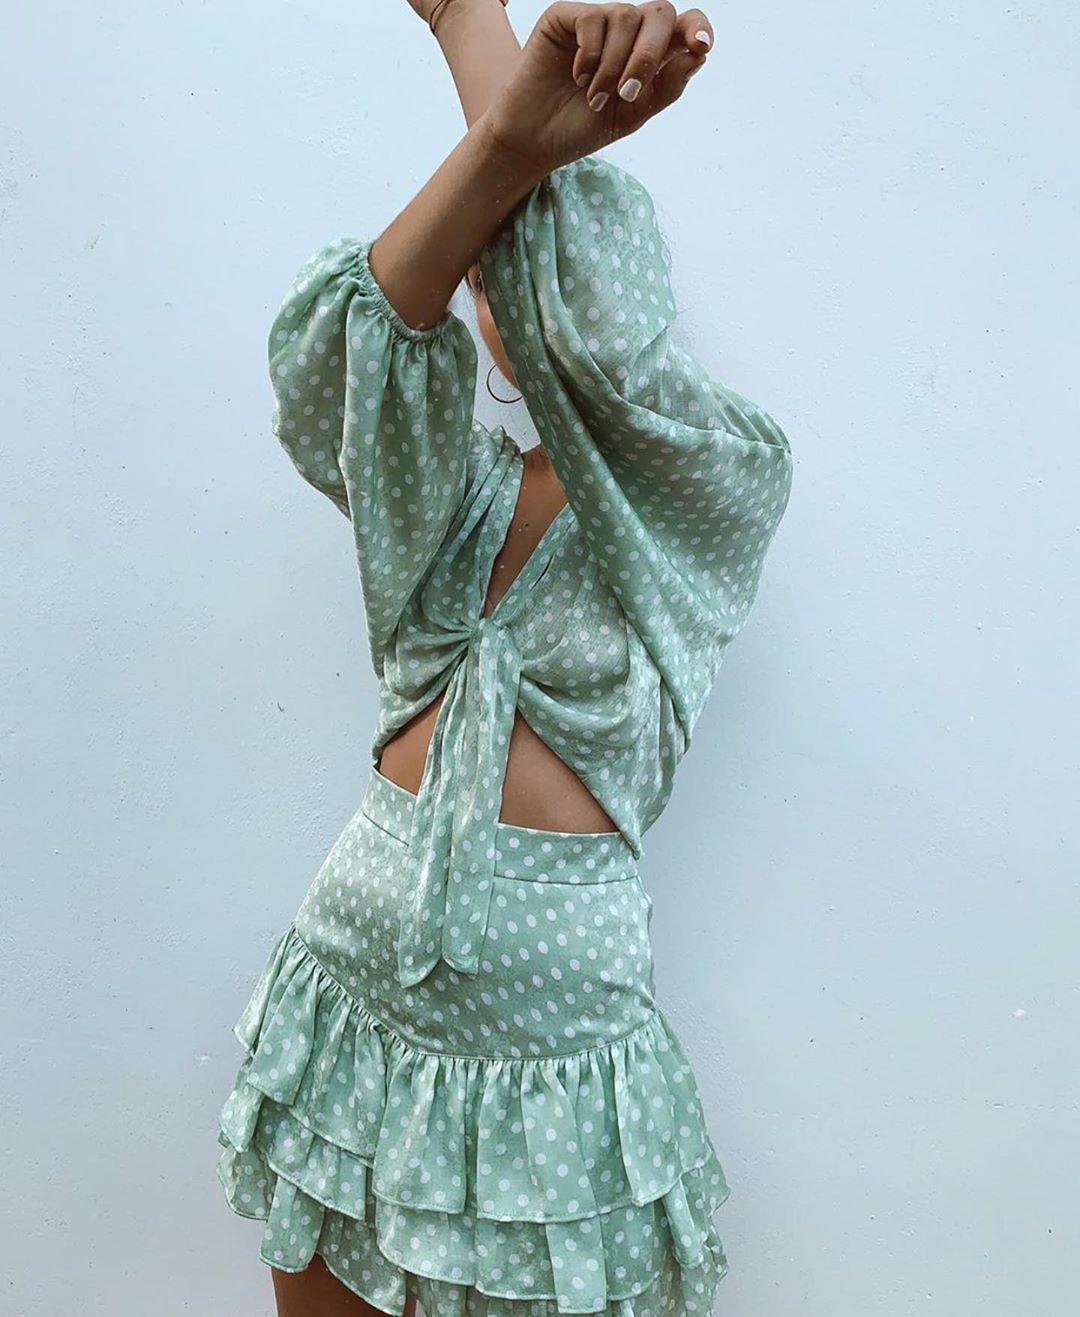 jacquard top with polka dots and bow de Zara sur zaraaddiction